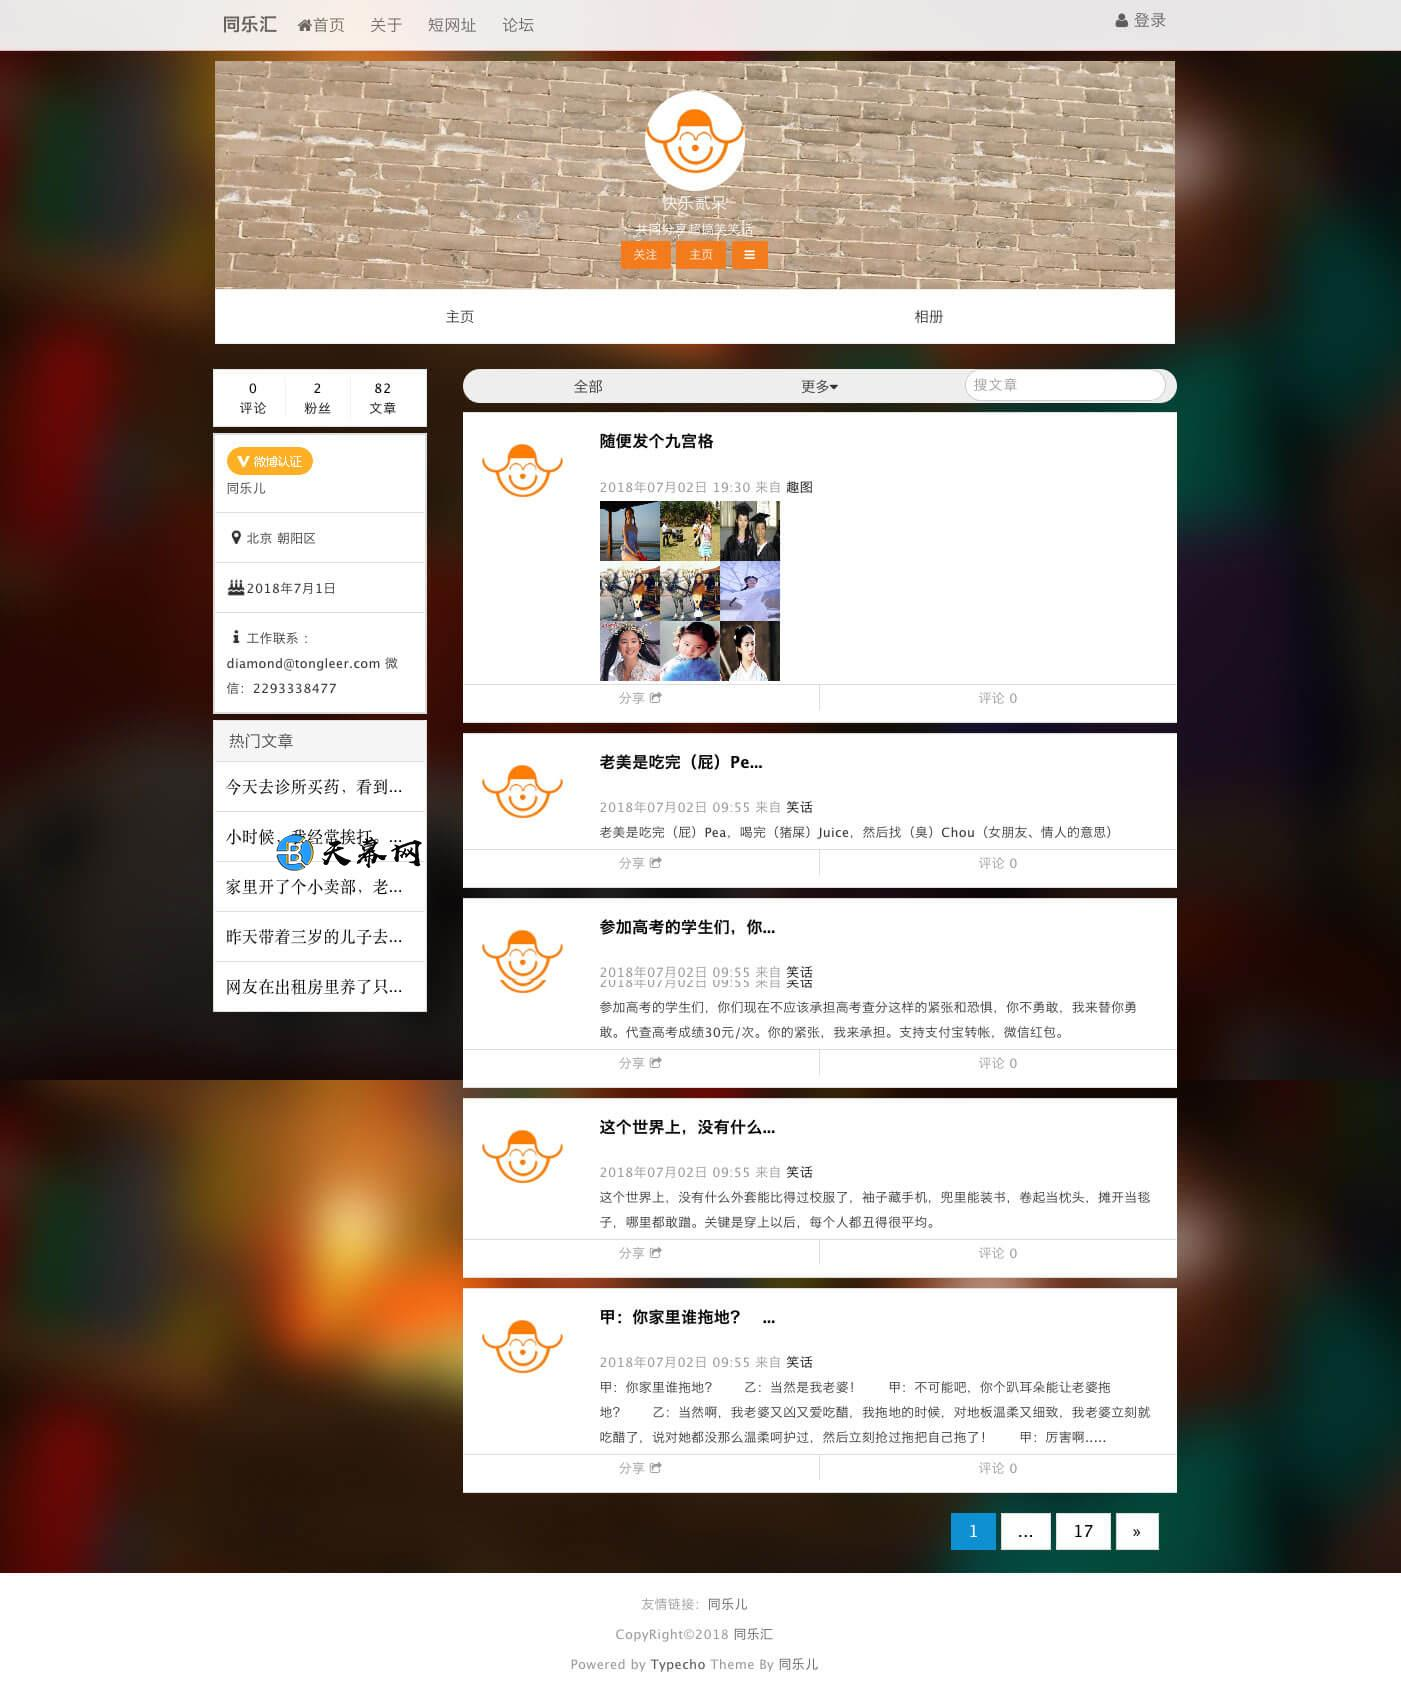 Typecho免费主题Weibo 微博主题